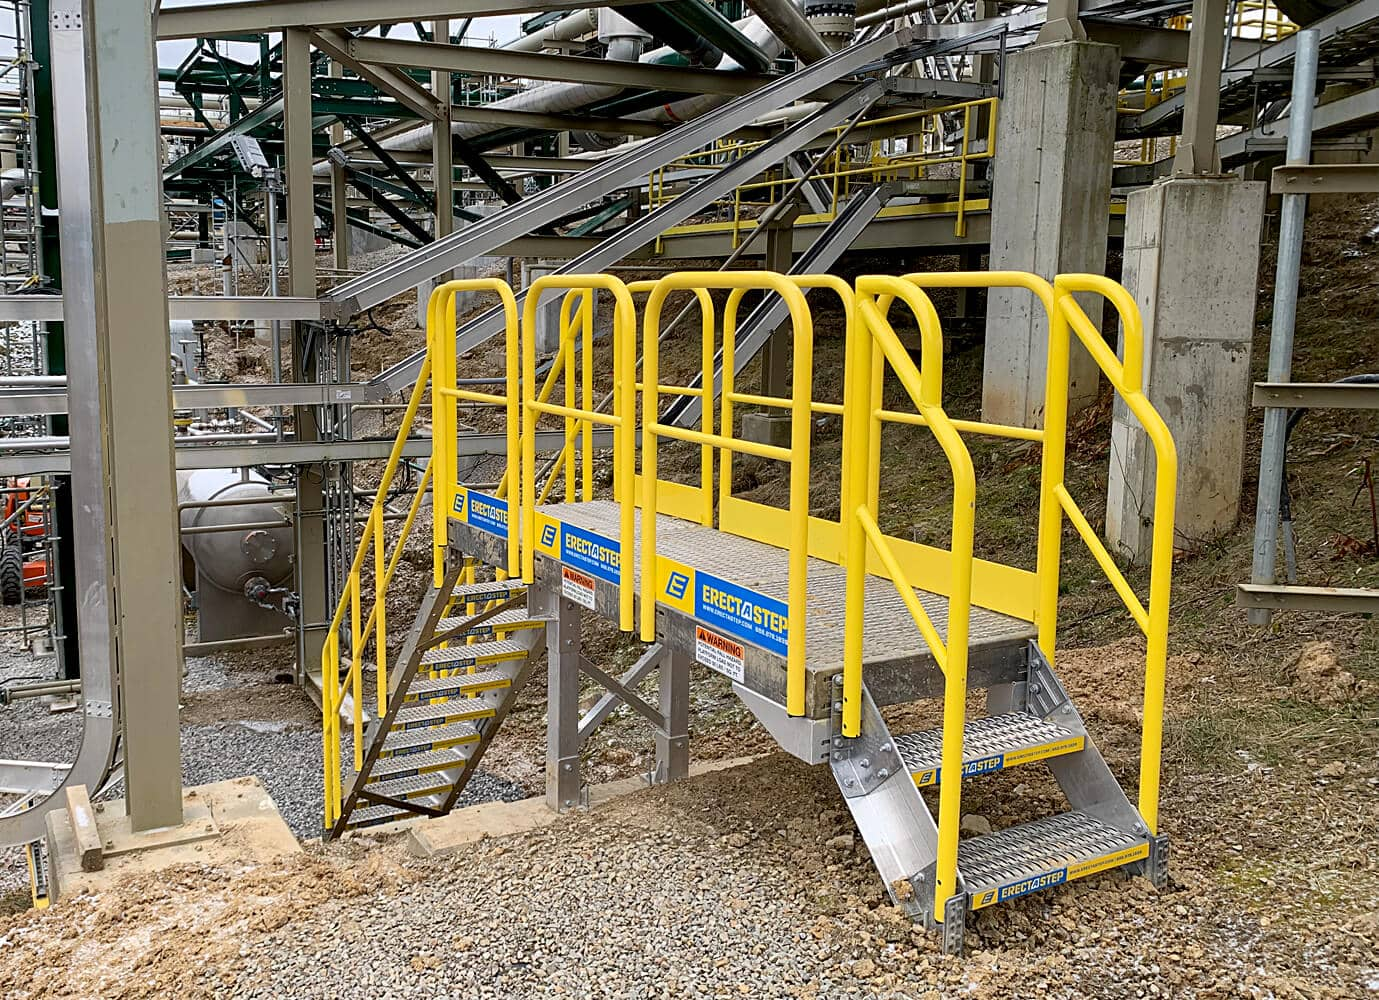 Powder coated metal stairs